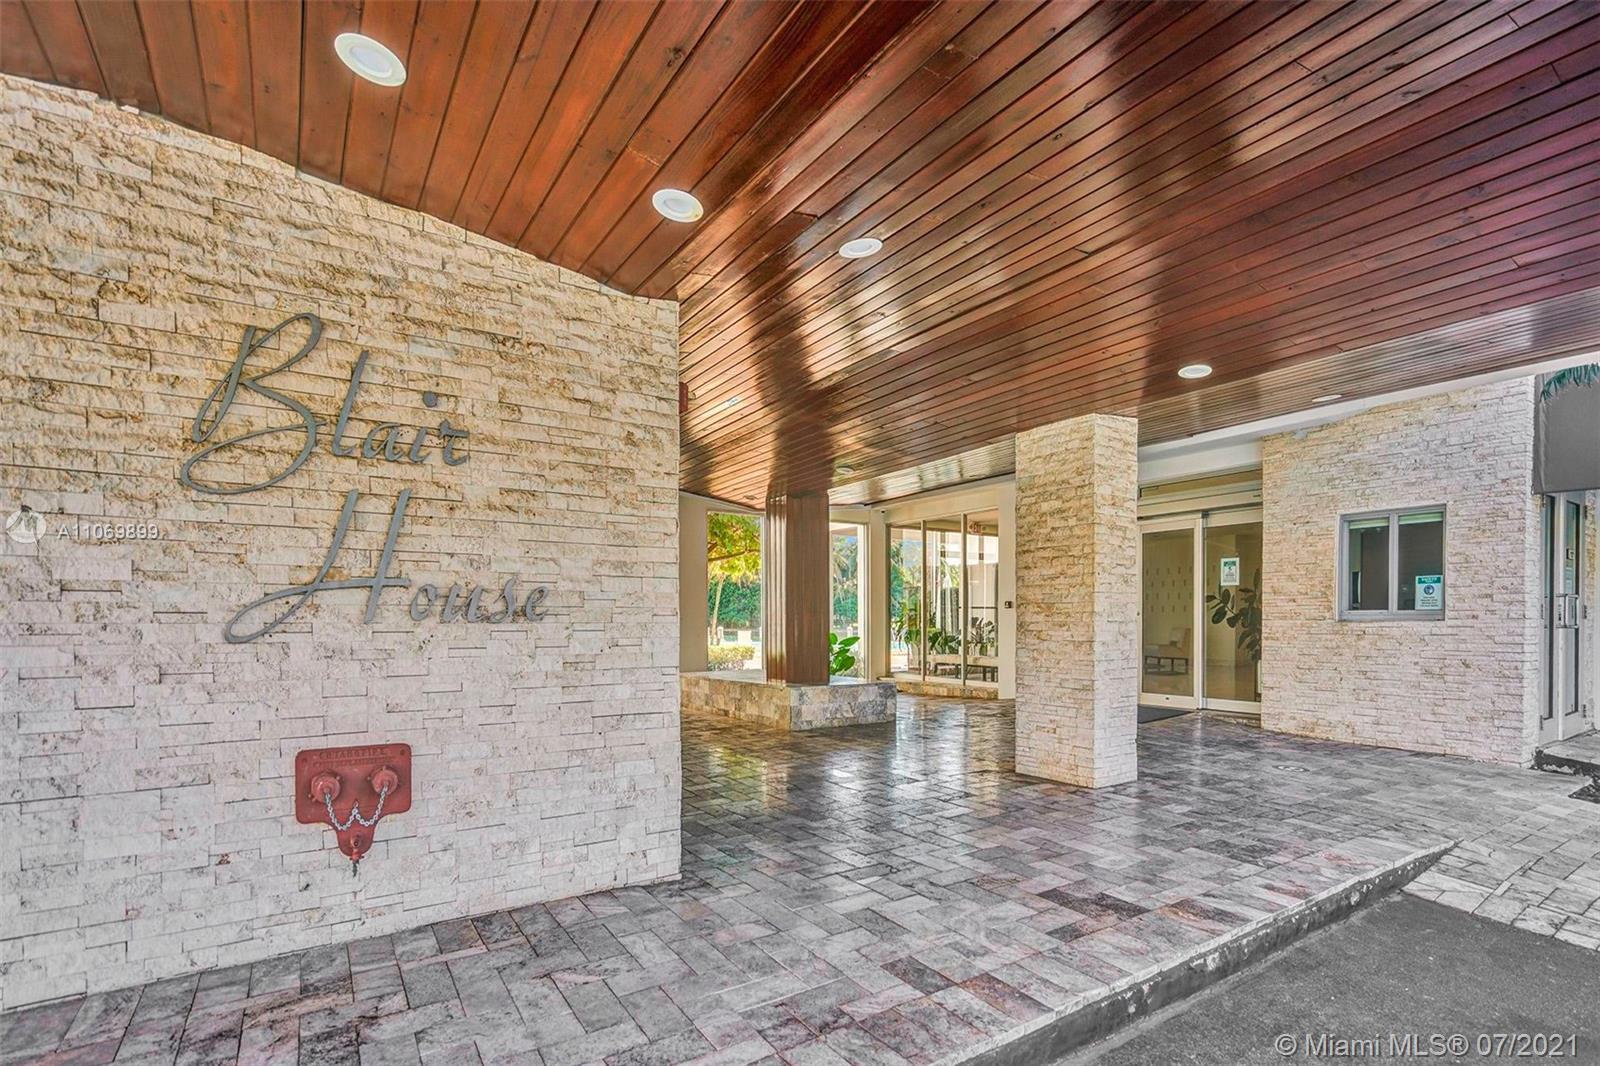 Photo of Blair House Condo - West Apt 10A